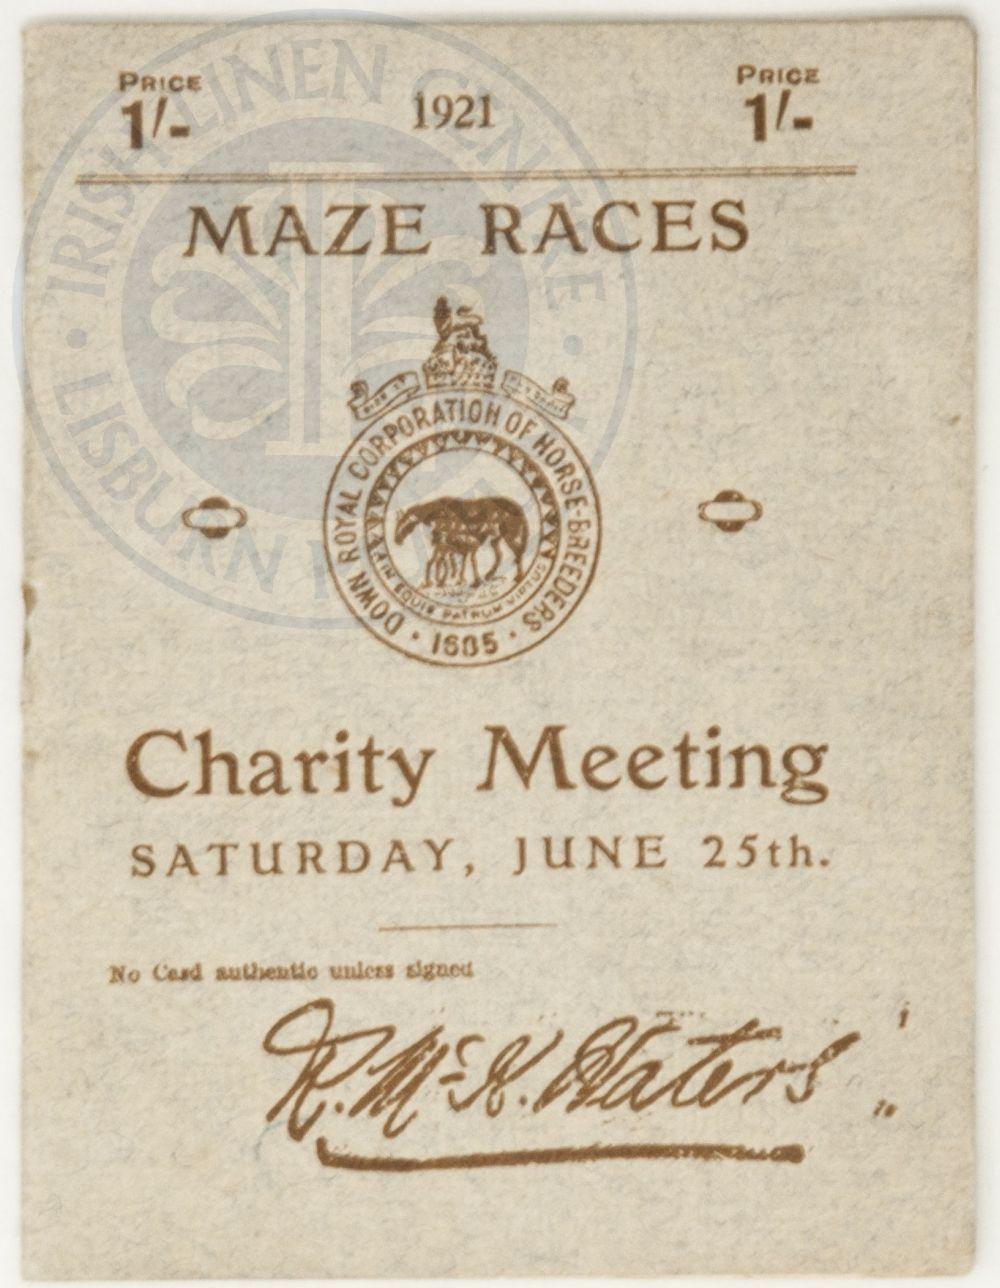 Programme, Down Royal Races, 1921 - ILC&LM Collection